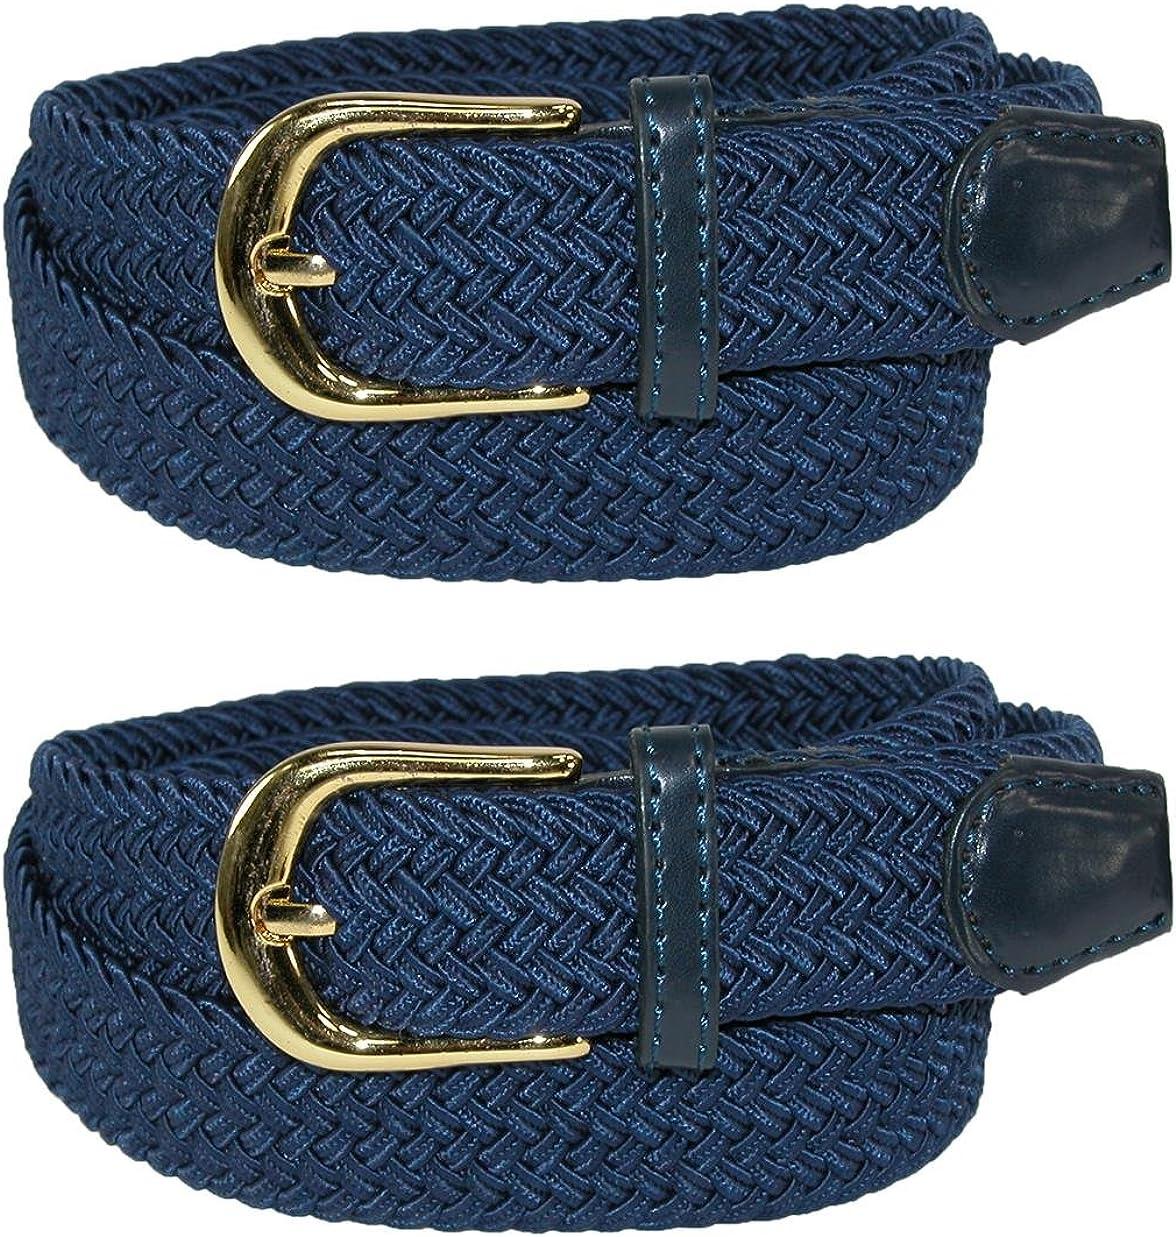 CTM Womens Elastic Braided Stretch Belt Pack of 2